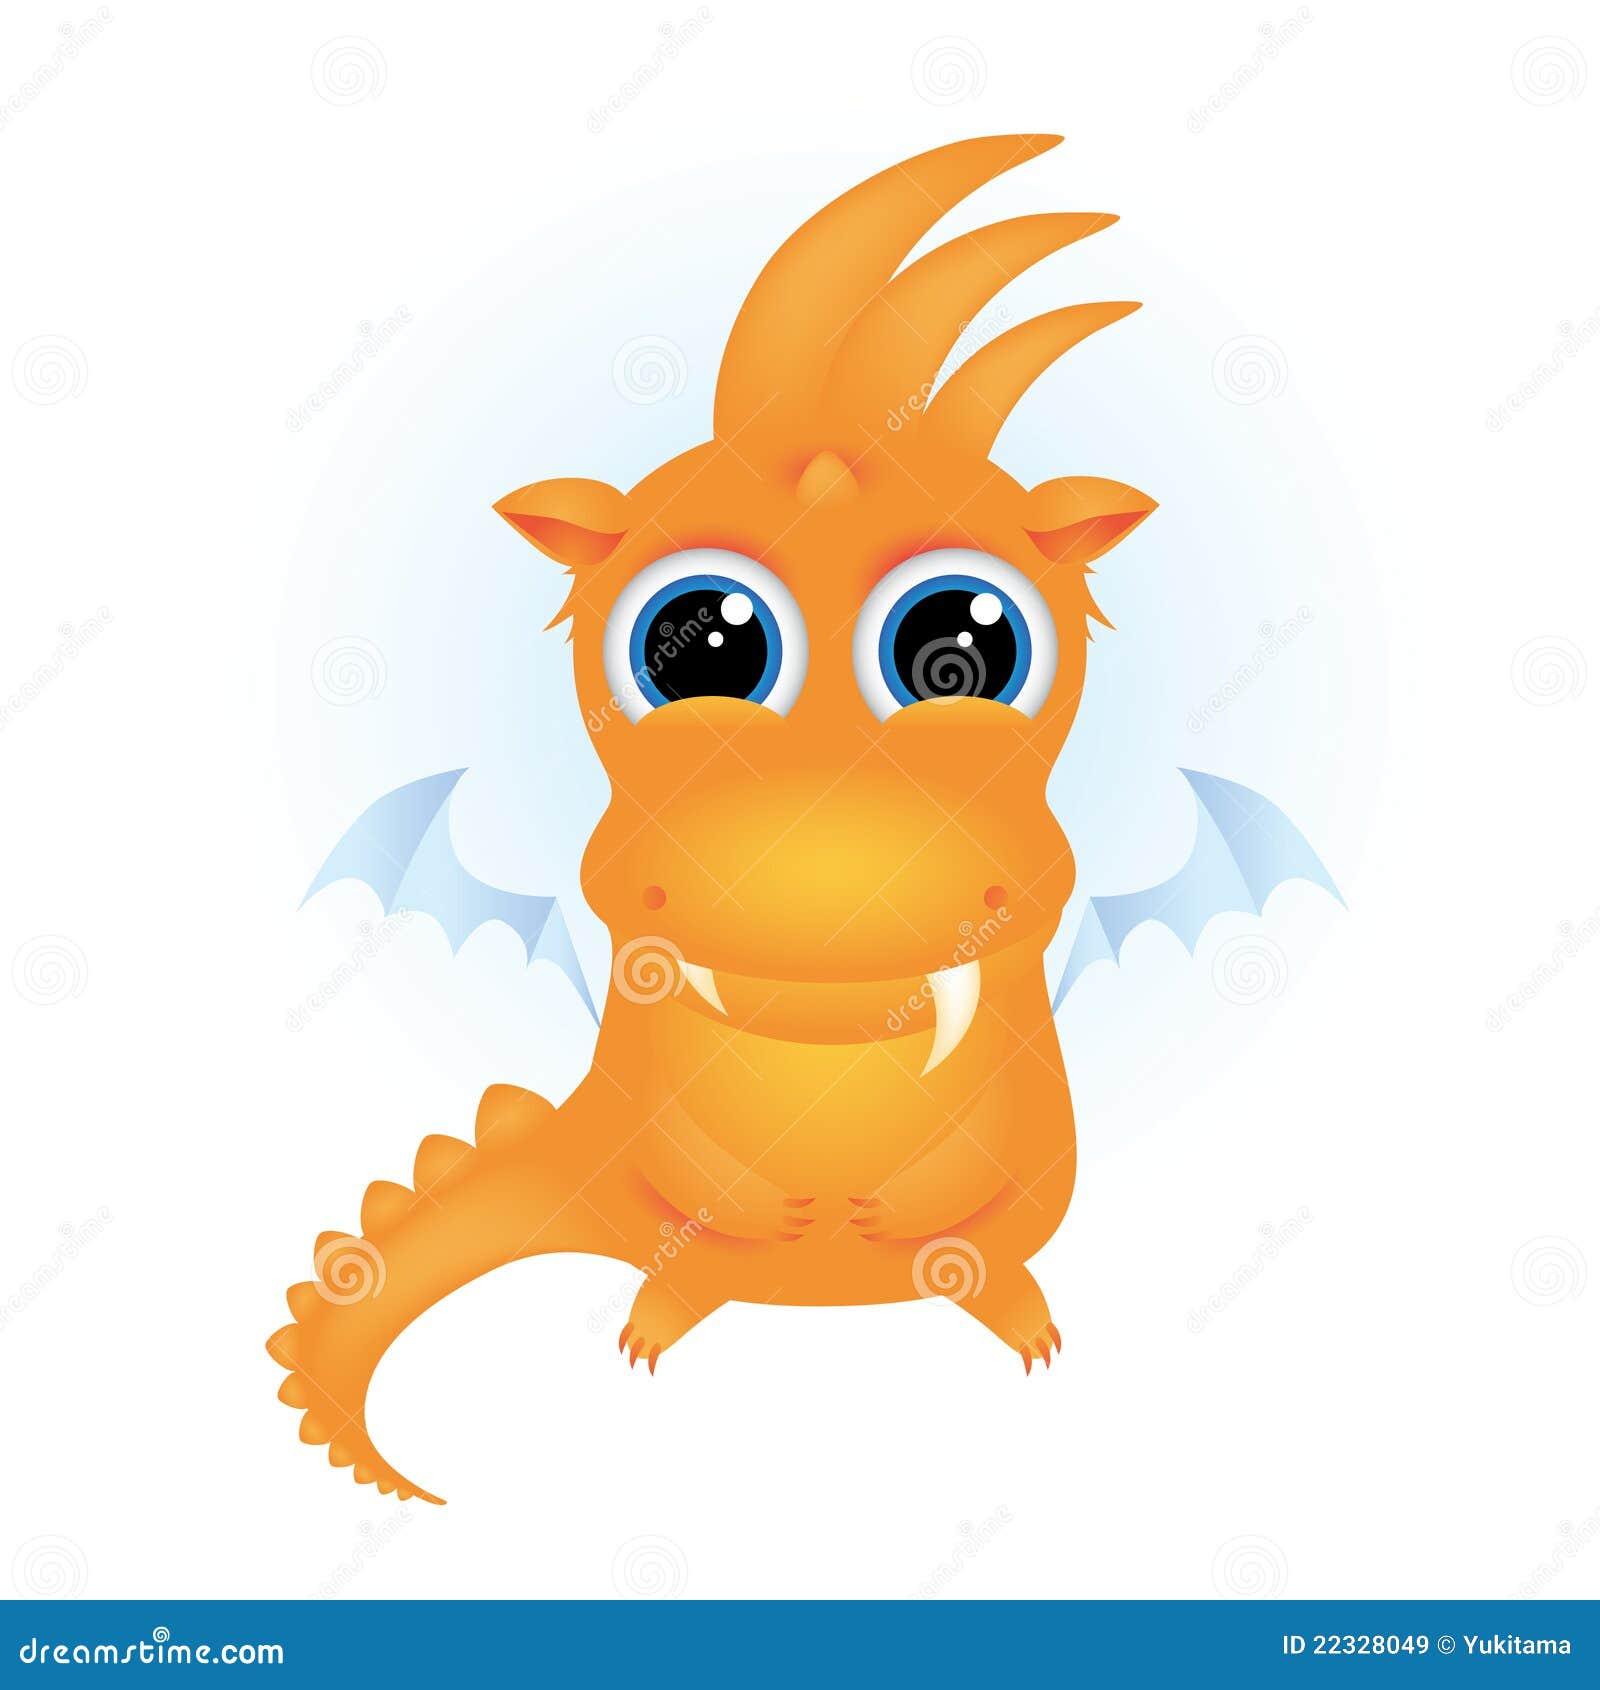 Cute Orange Cartoon Dragon Royalty Free Stock Images - Image: 22328049